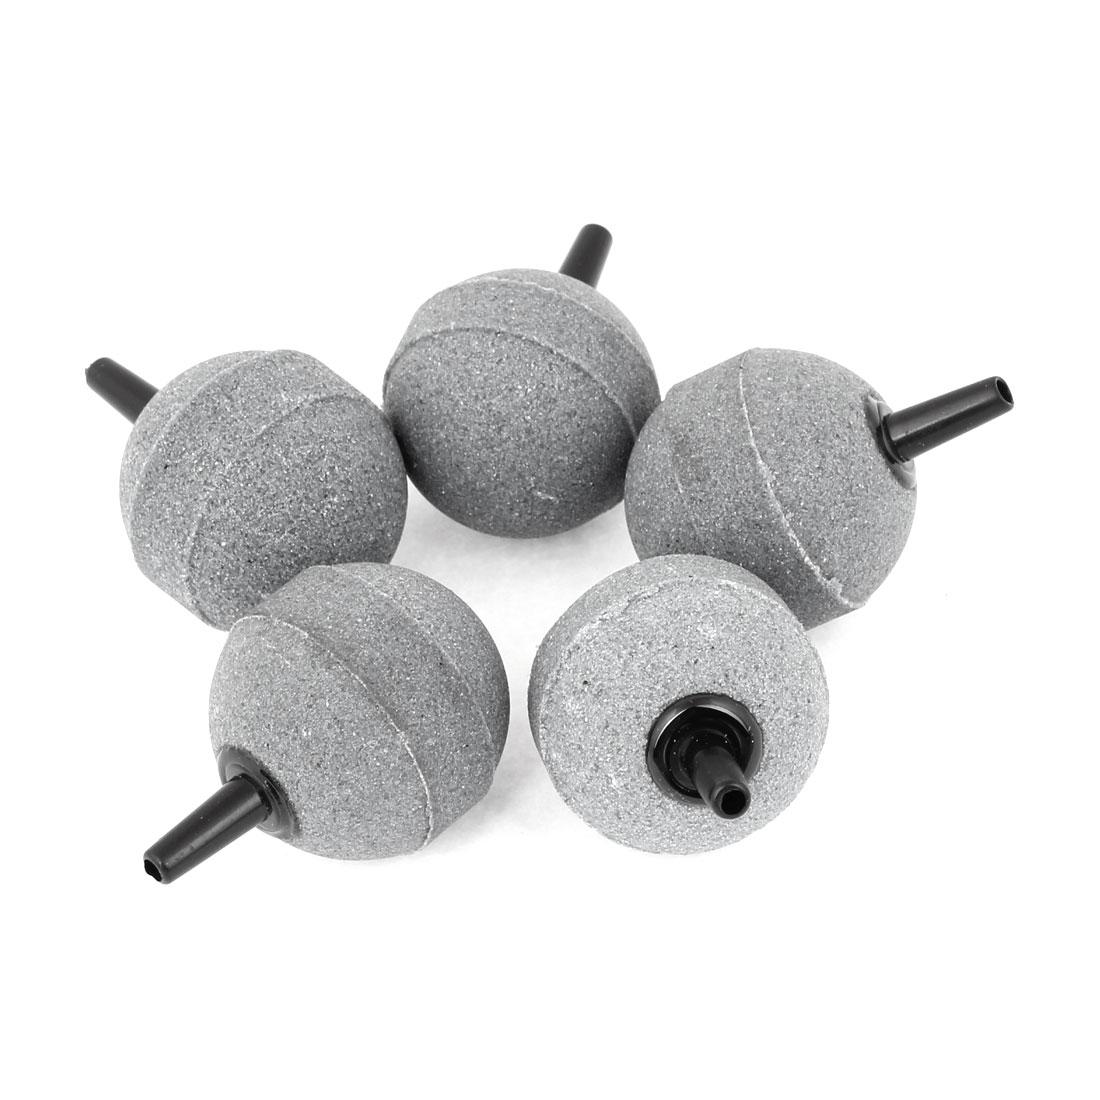 "5 Pcs Gray 1.1"" 30mm Dia Ball Shaped Bubble Air Stone for Aquarium"